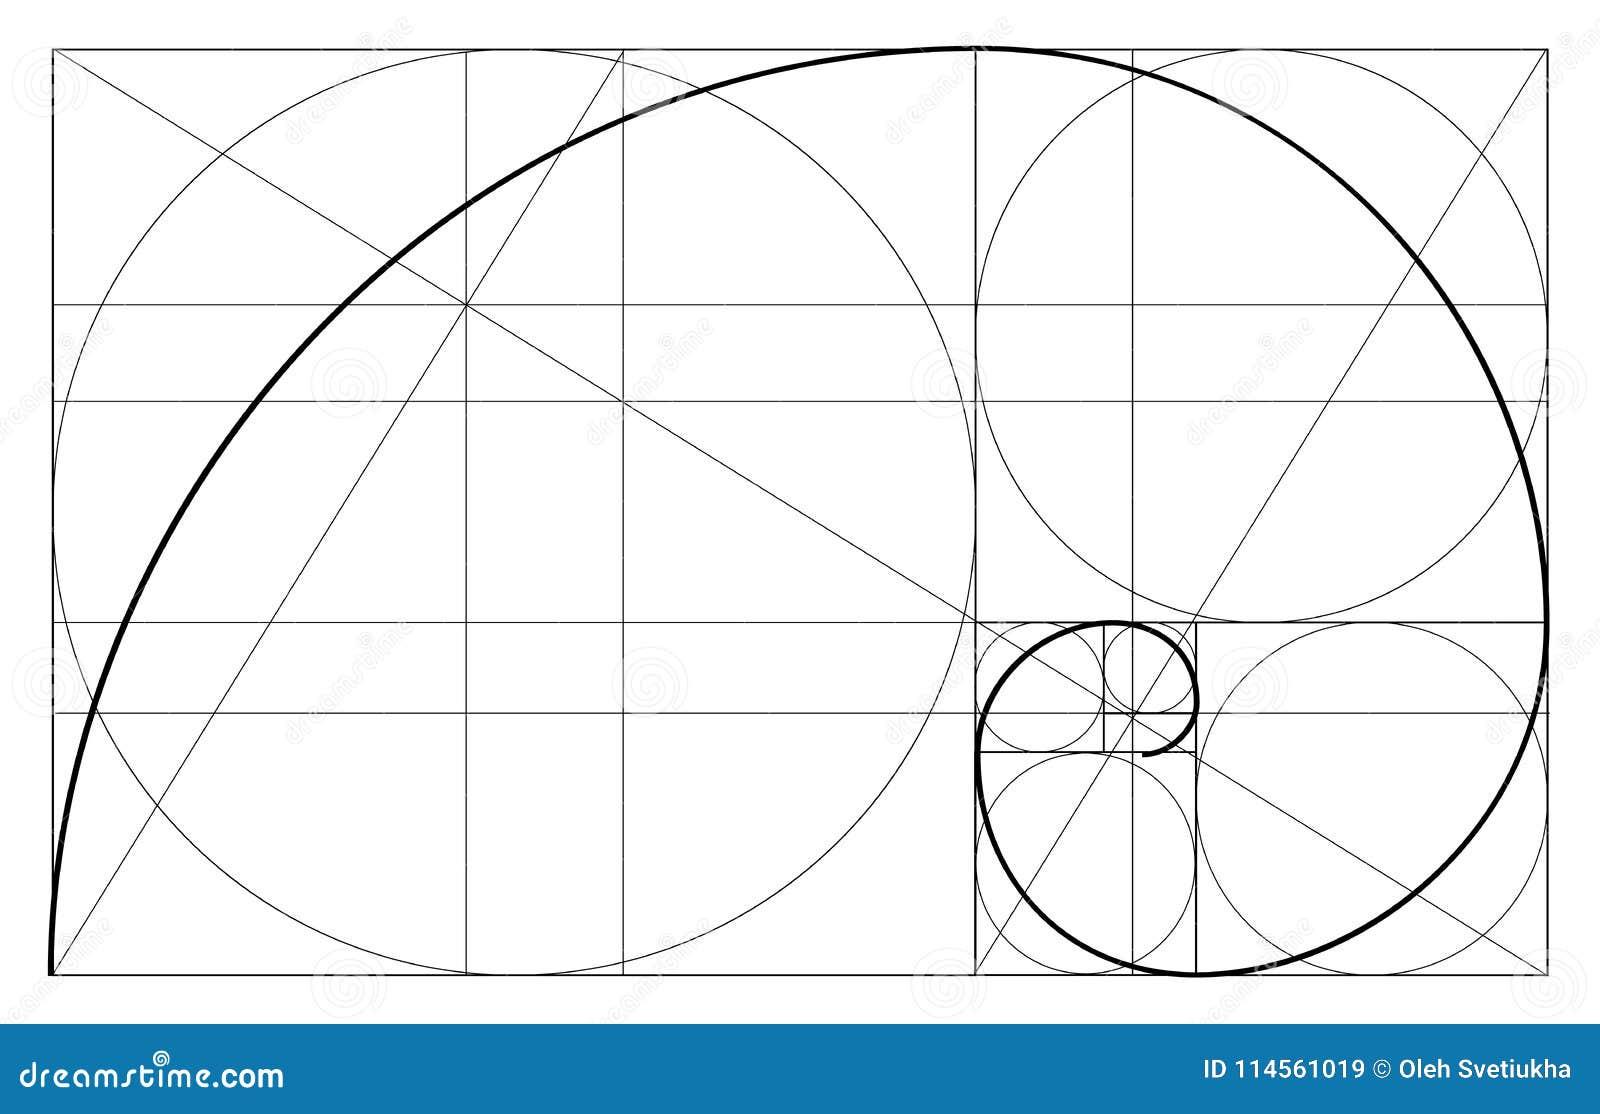 Minimalistic style design. Golden ratio. Geometric shapes. Circles in golden proportion. Futuristic design. Logo. Vector icon. Abs